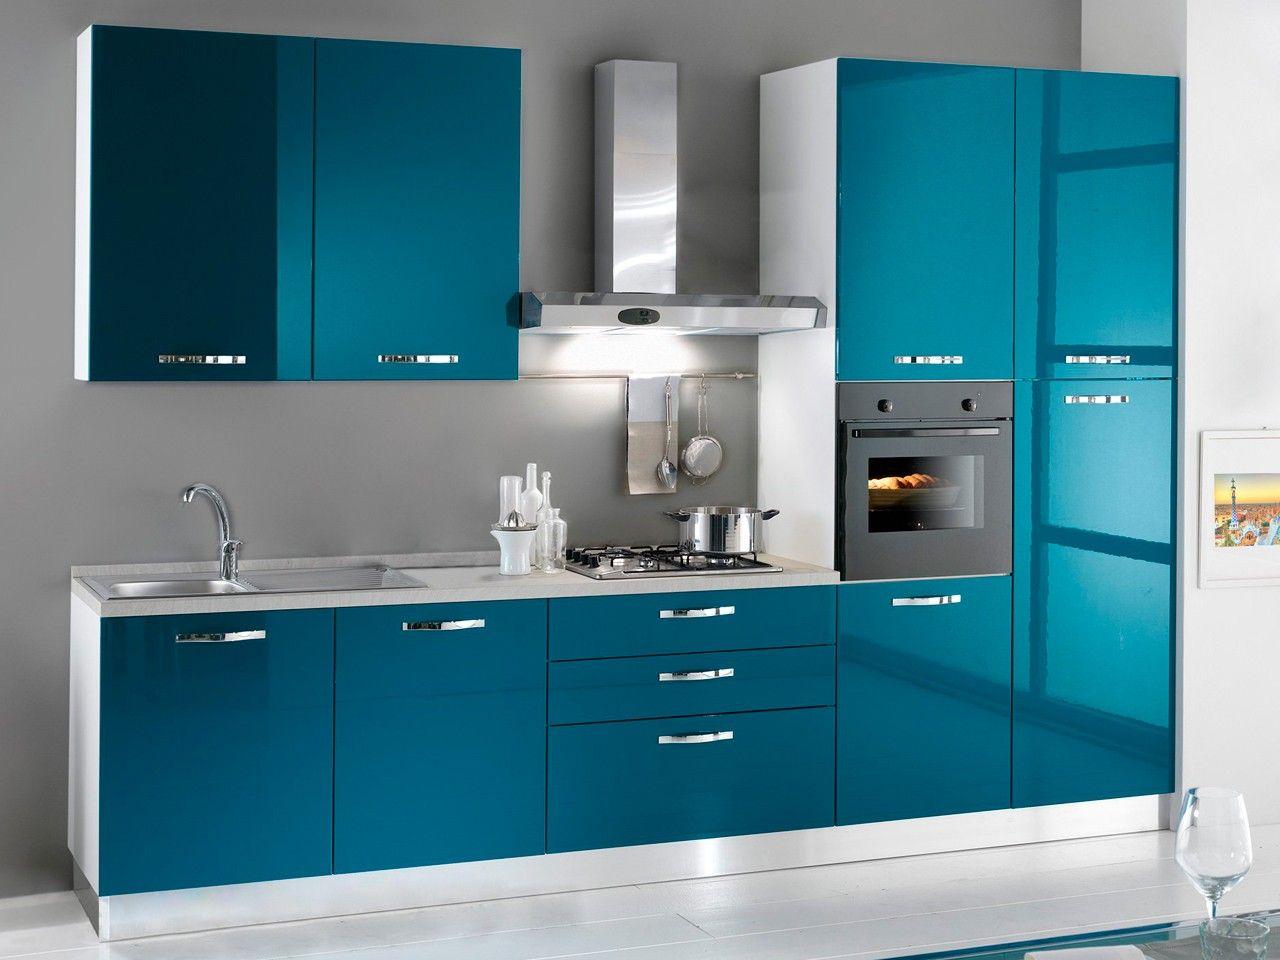 cocinas pequeñas de color azul turquesa   Cosinetas   Pinterest ...